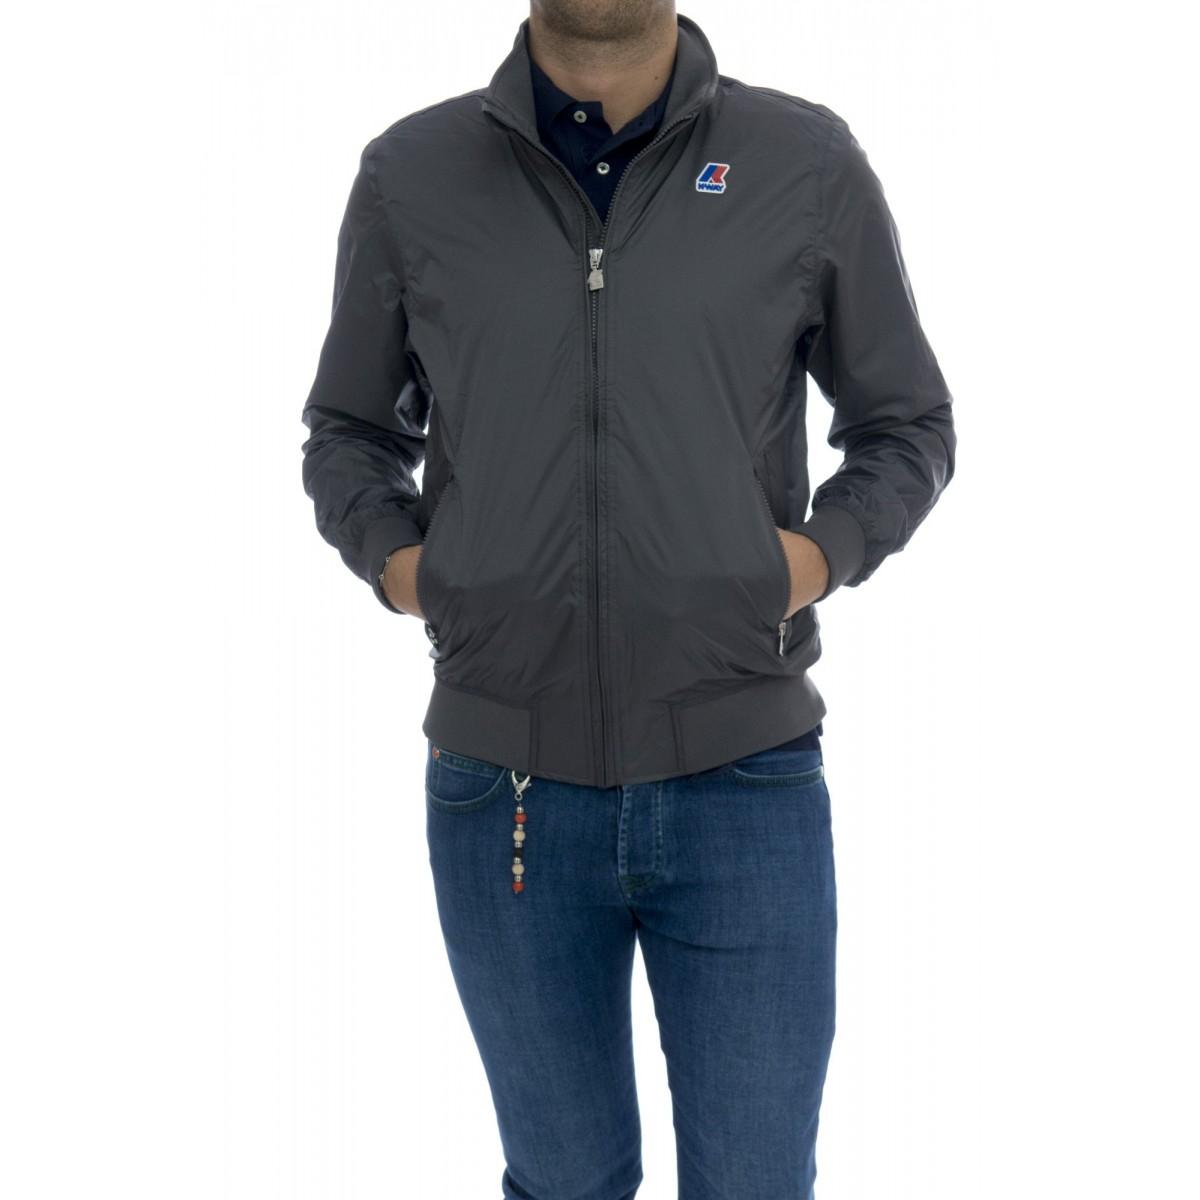 Giubbino - Johnny jersey k007pe0 interno jersey